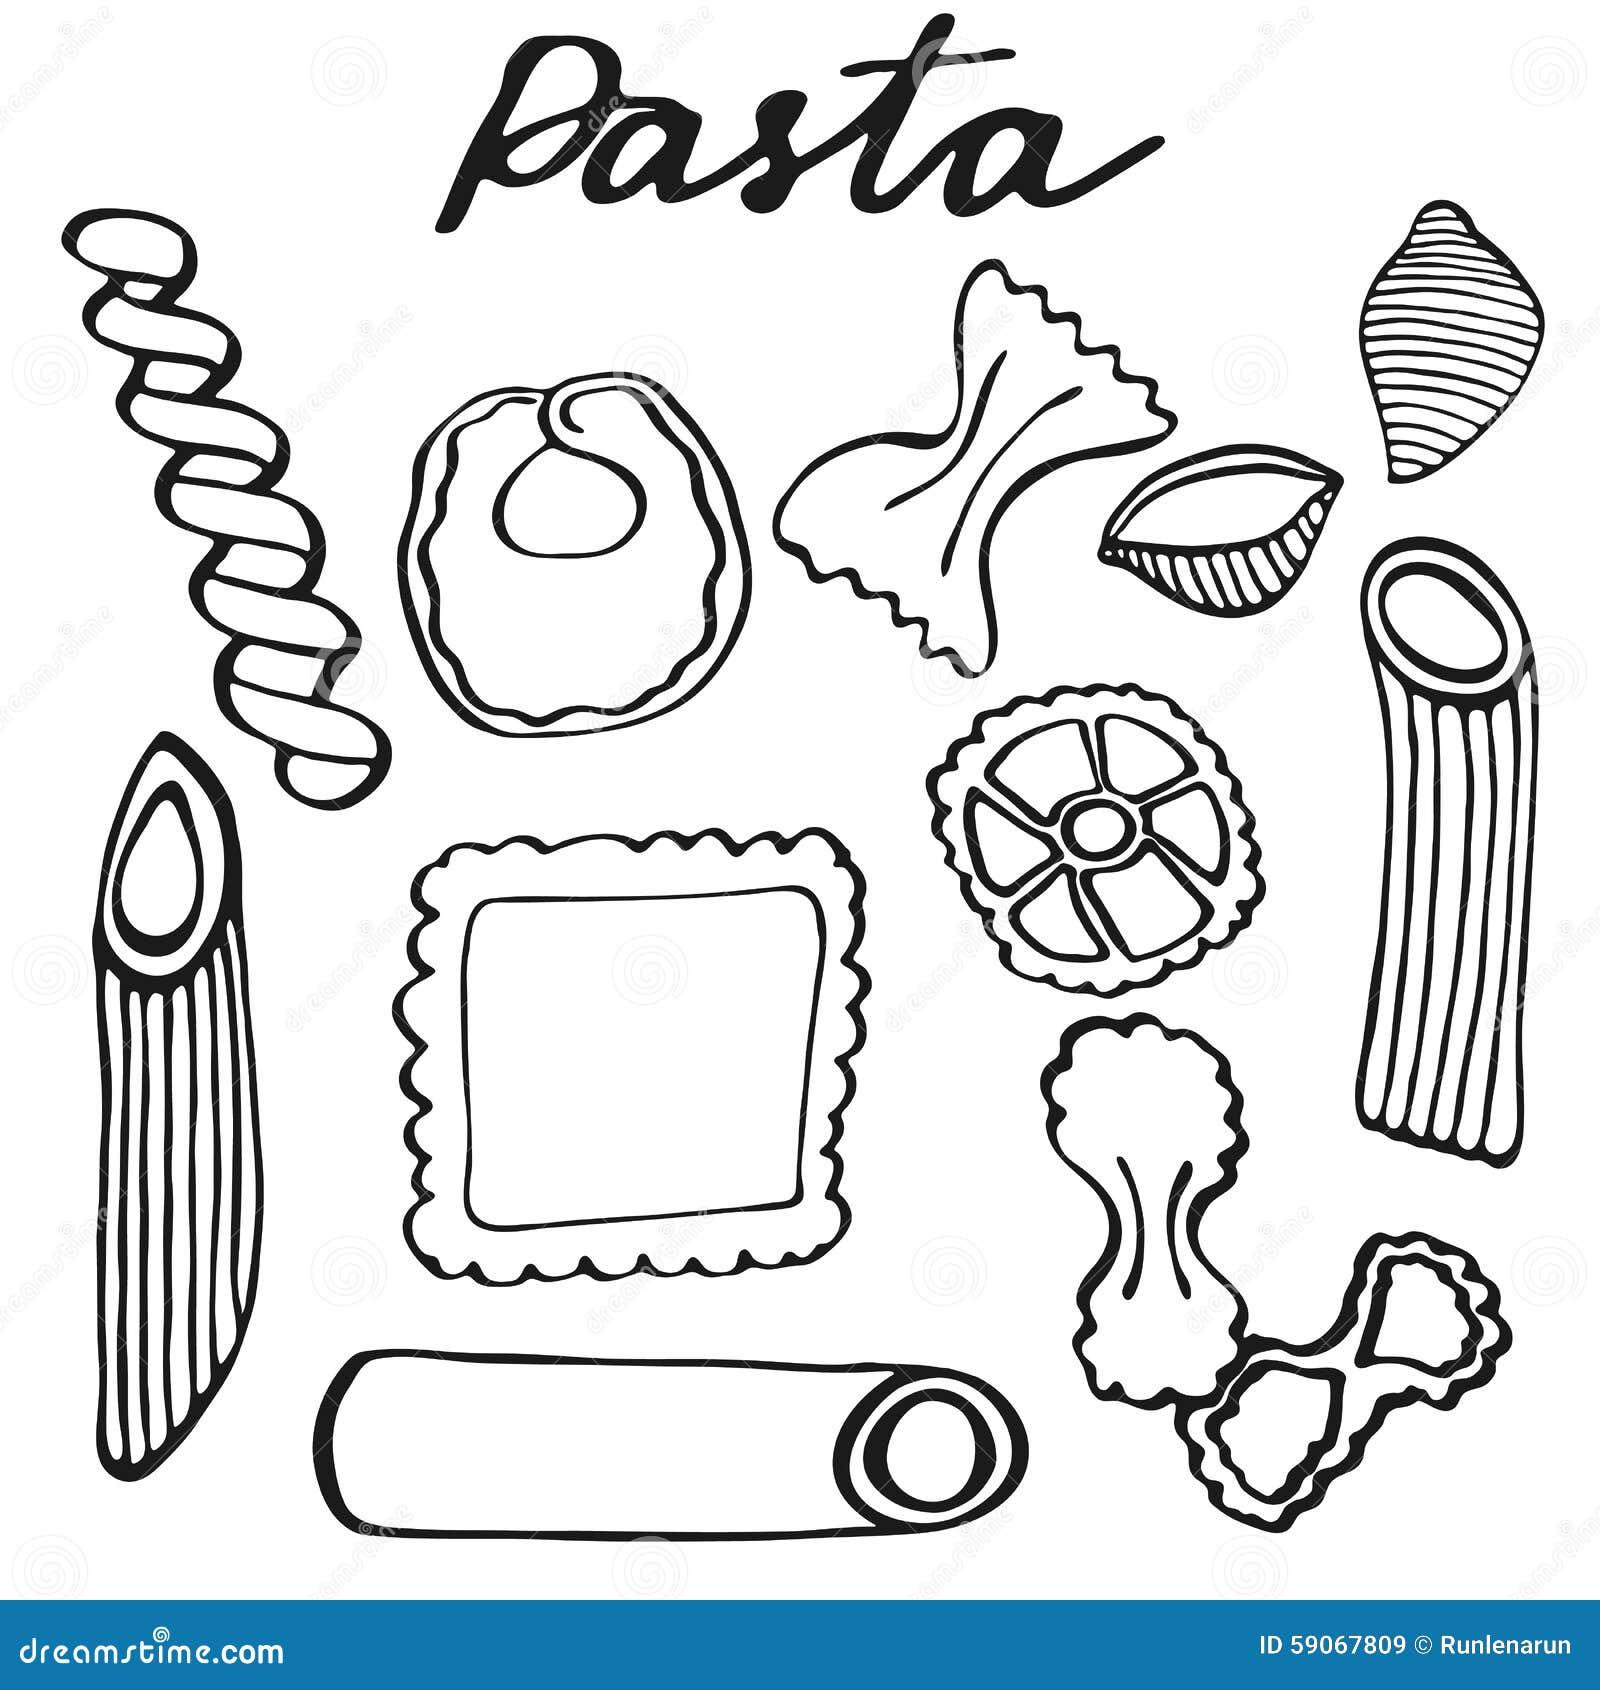 Pasta set hand drawn cartoon kinds of pasta doodle for How to make doodle art